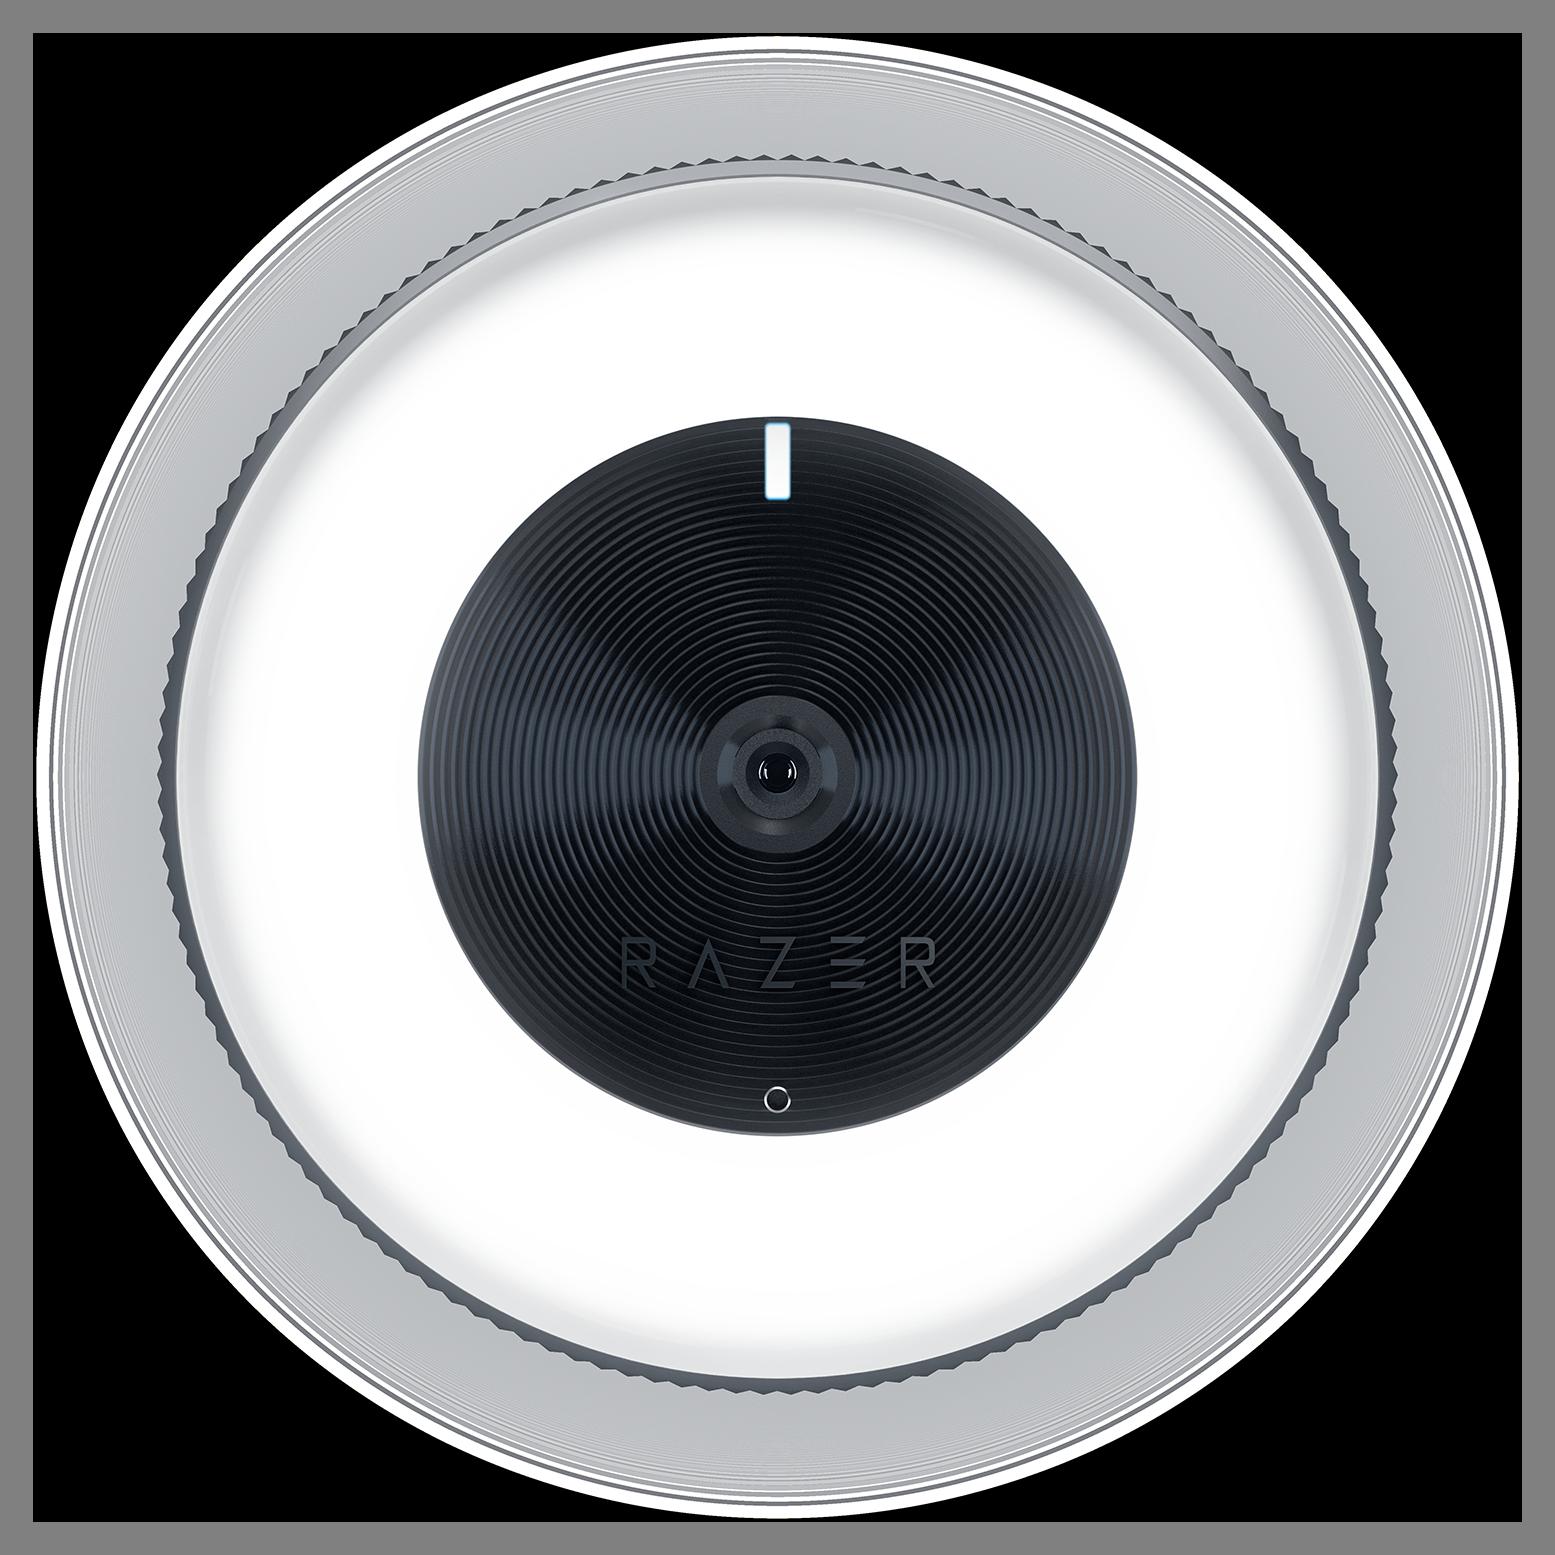 Front view of the Razer Kiyo - Broadcasting Web Camera with Illumination Ring